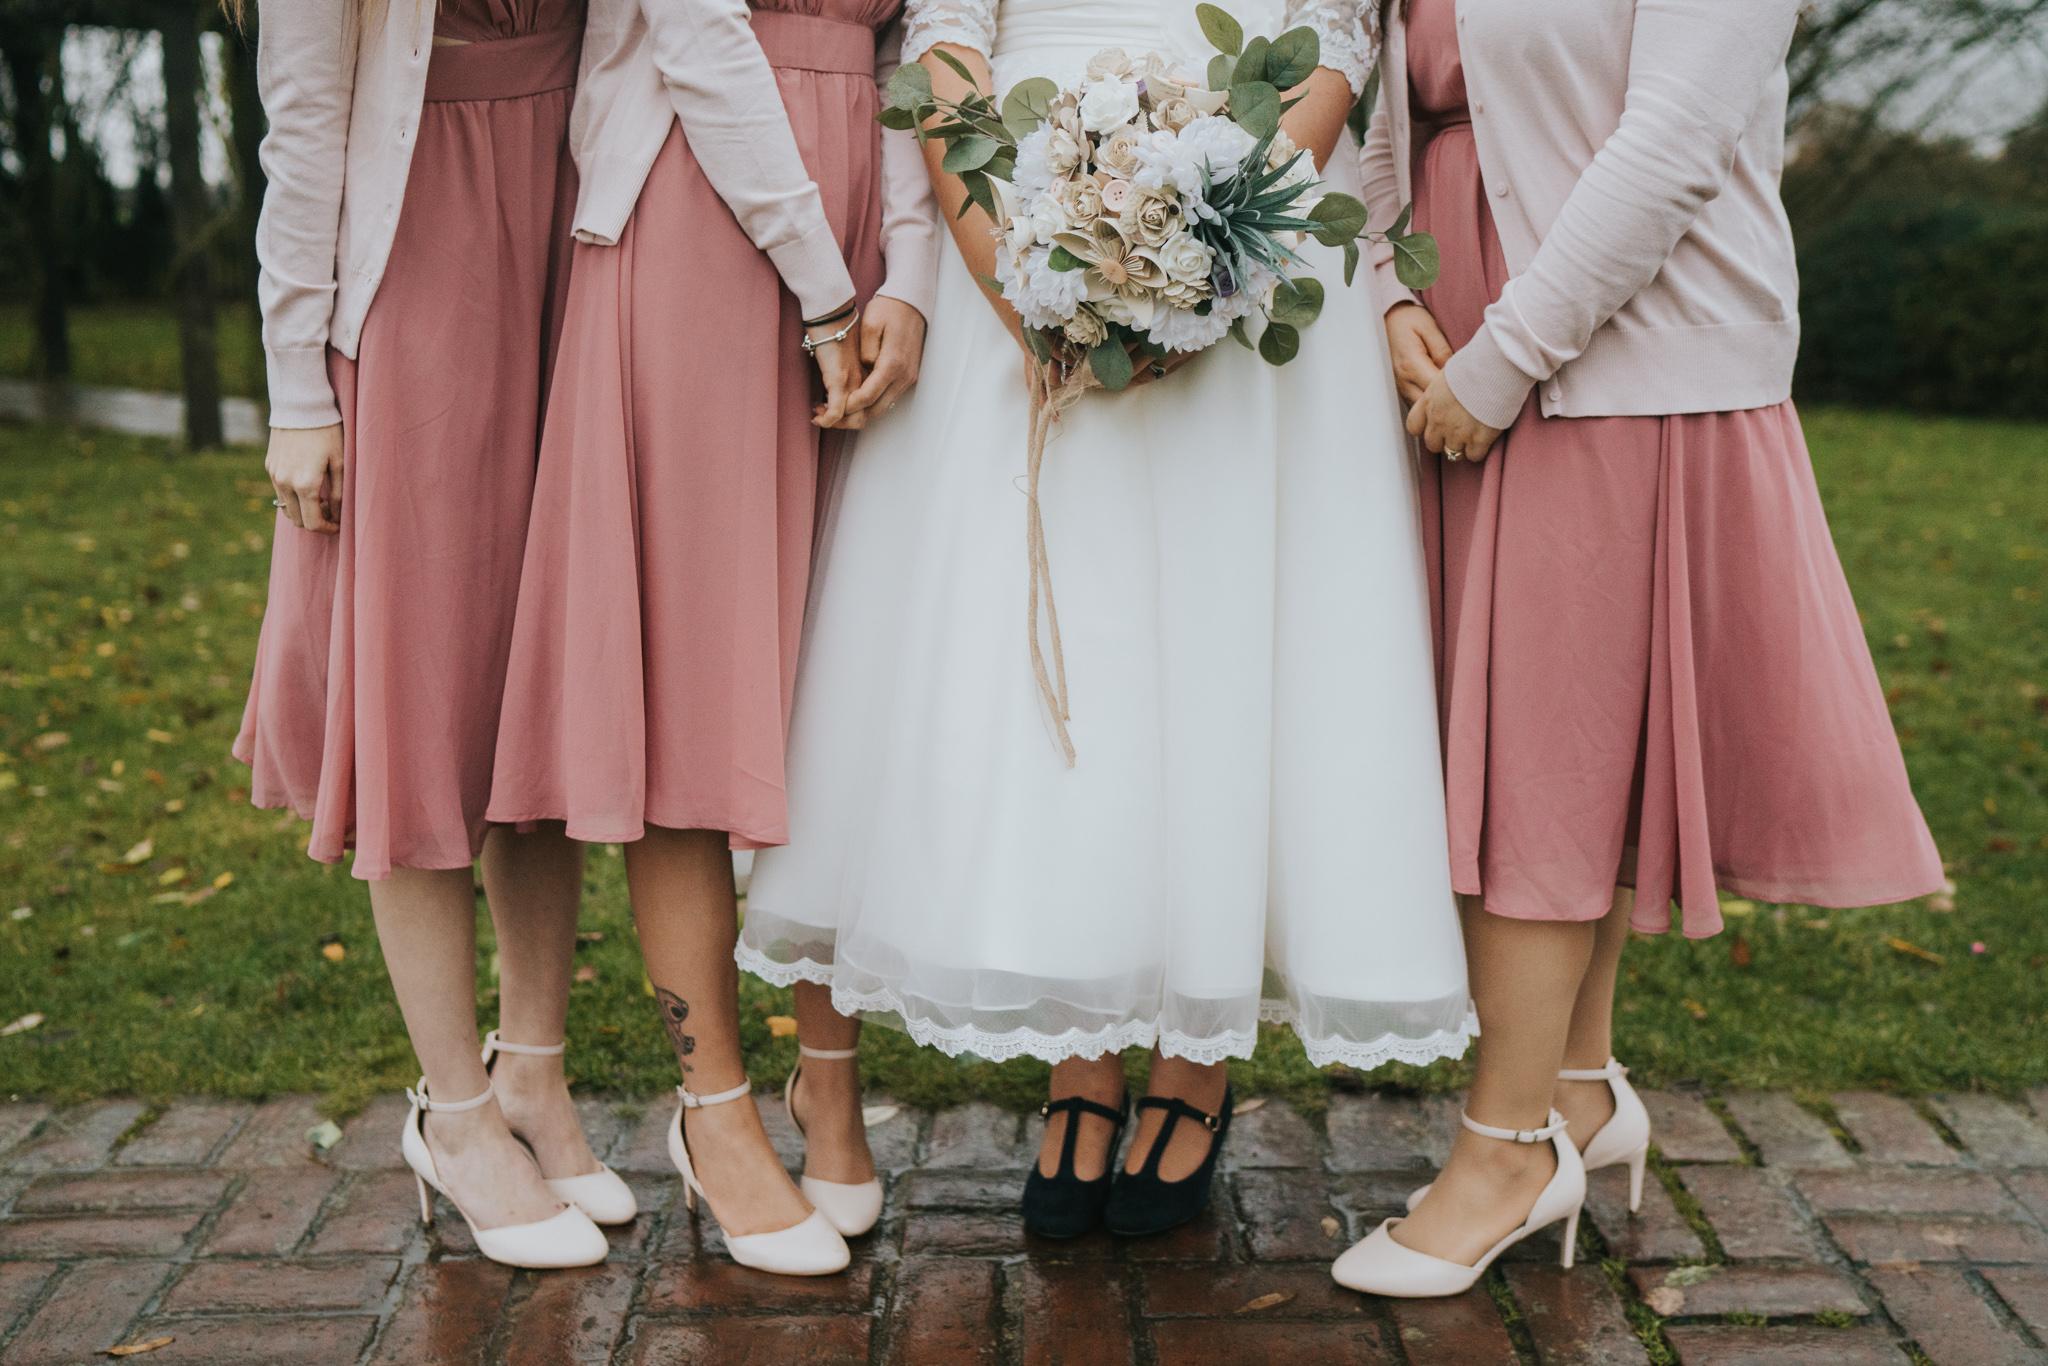 rhia-james-rustic-crabbs-barn-vintage-50s-retro-wedding-grace-elizabeth-colchester-essex-alternative-relaxed-wedding-family-photography-devon-suffolk-norfolk-essex (101 of 138).jpg